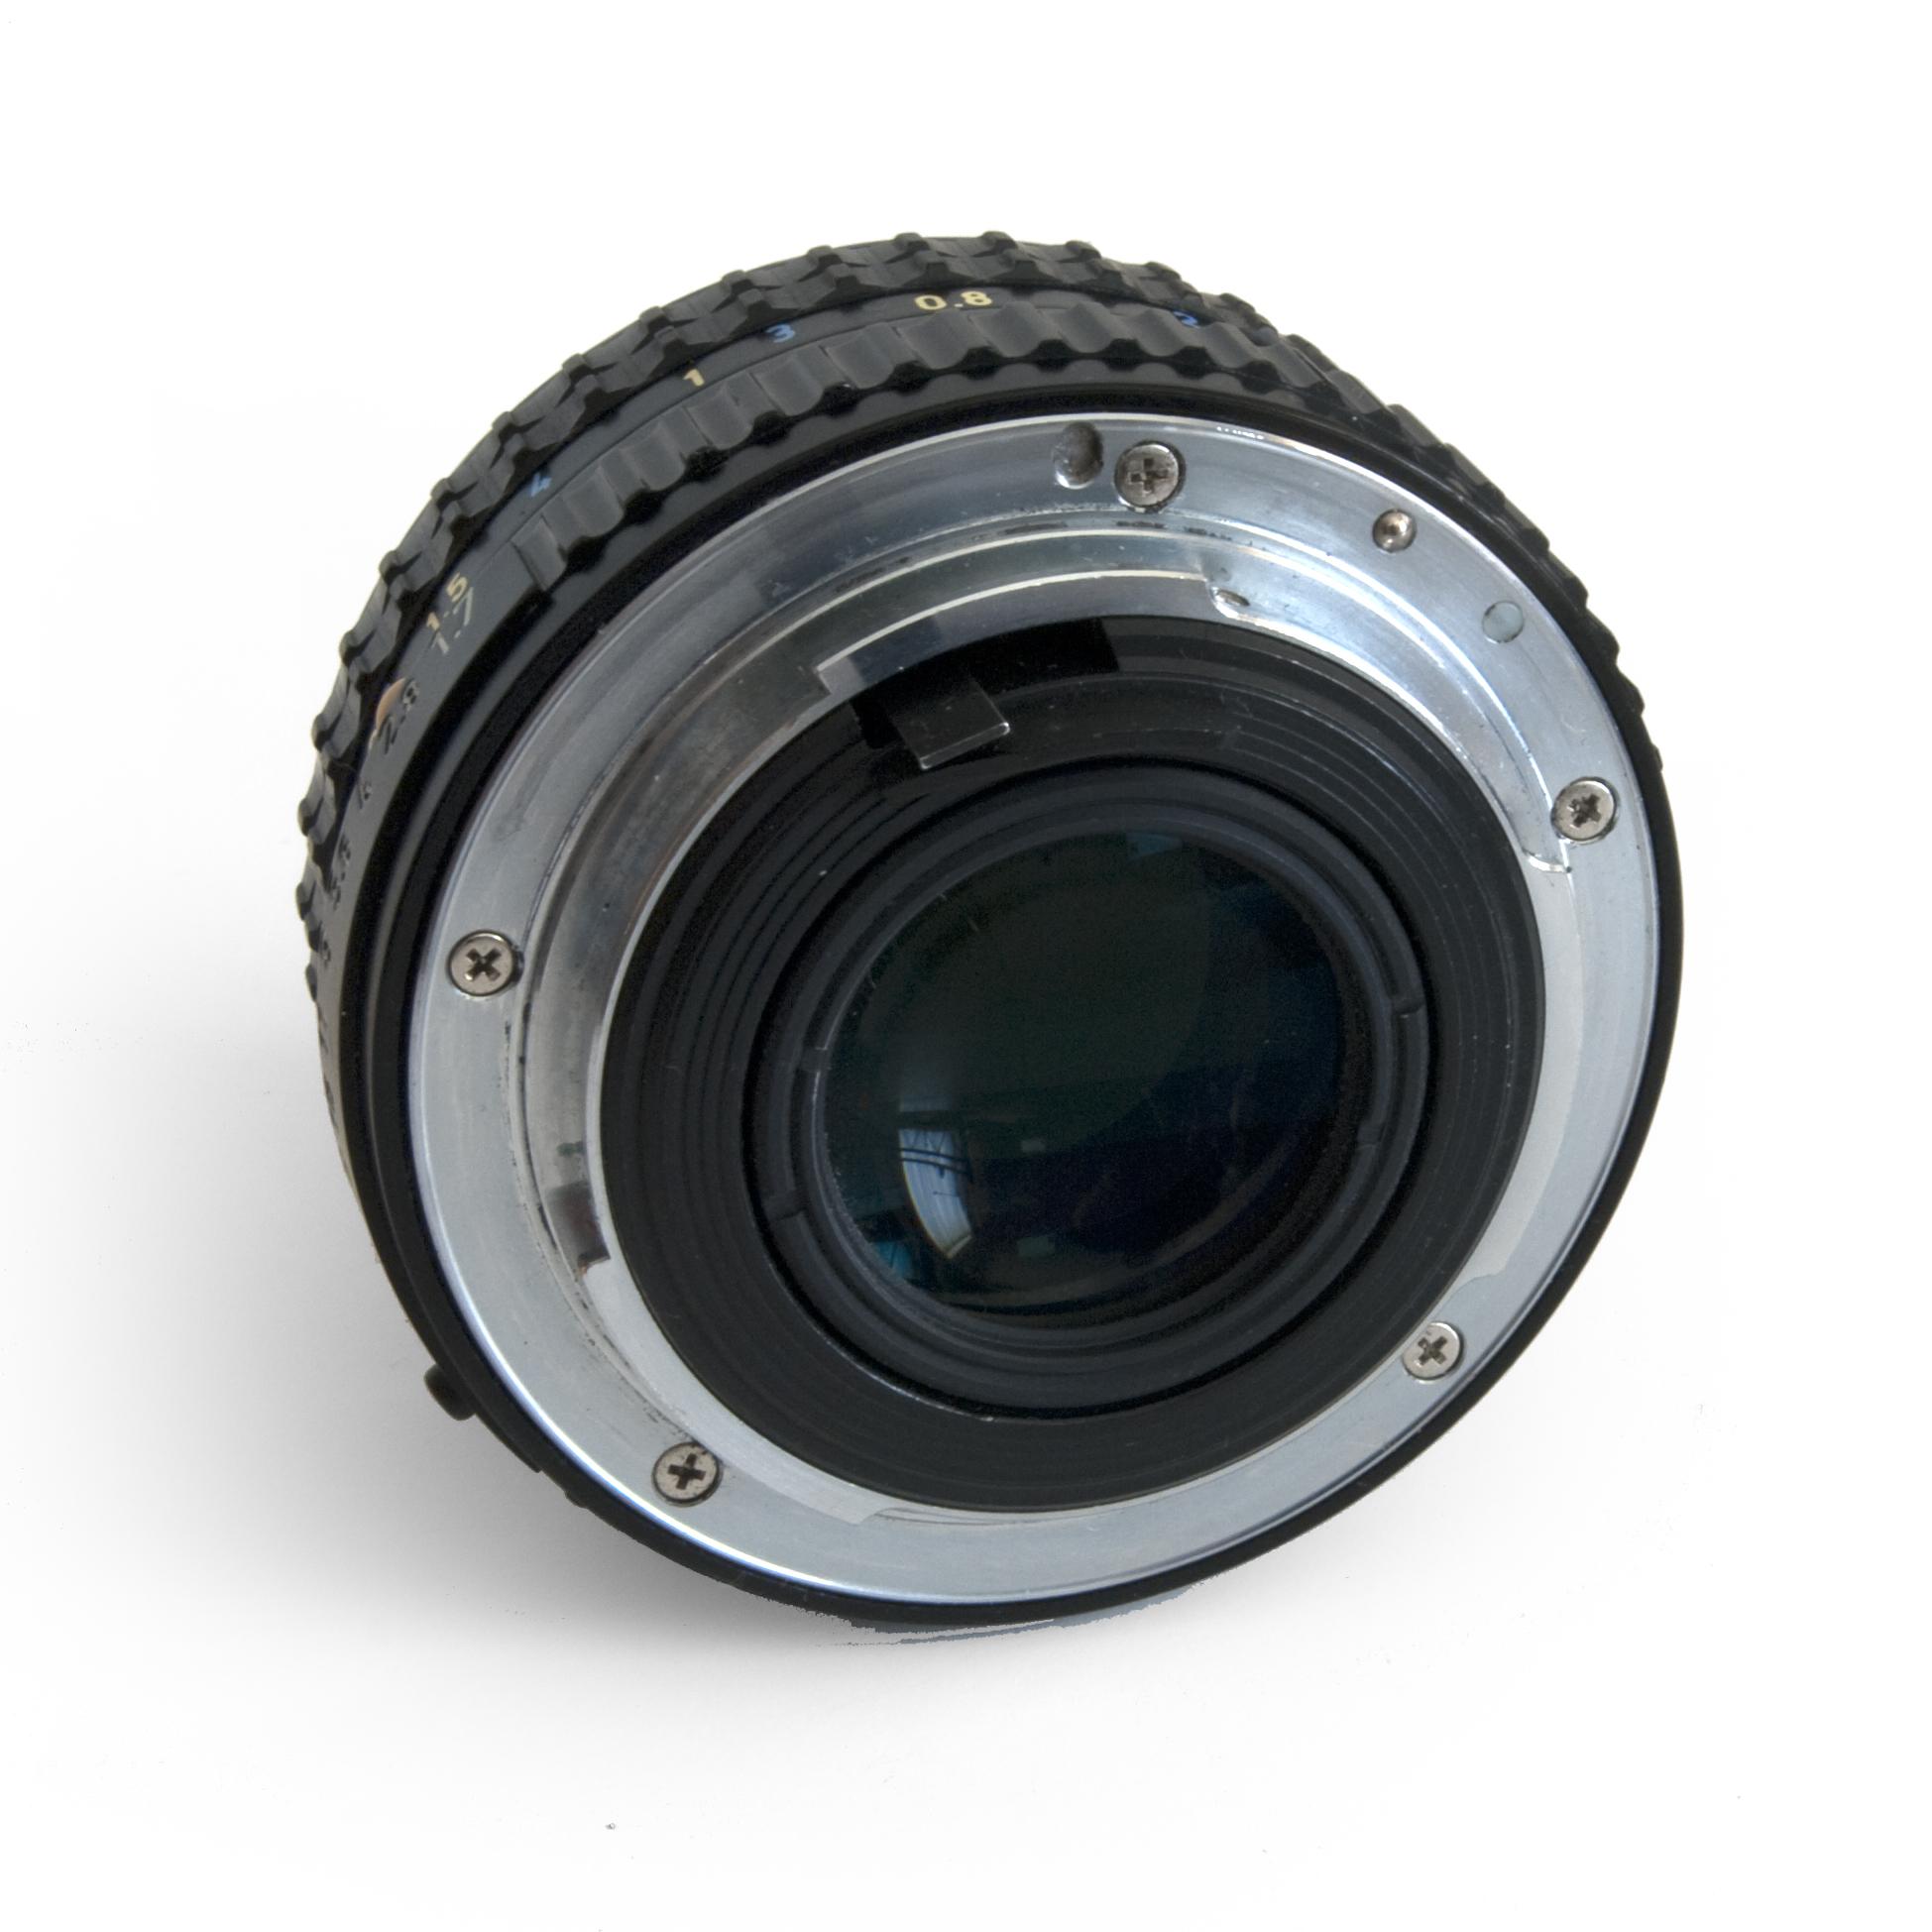 bayonet lens mount